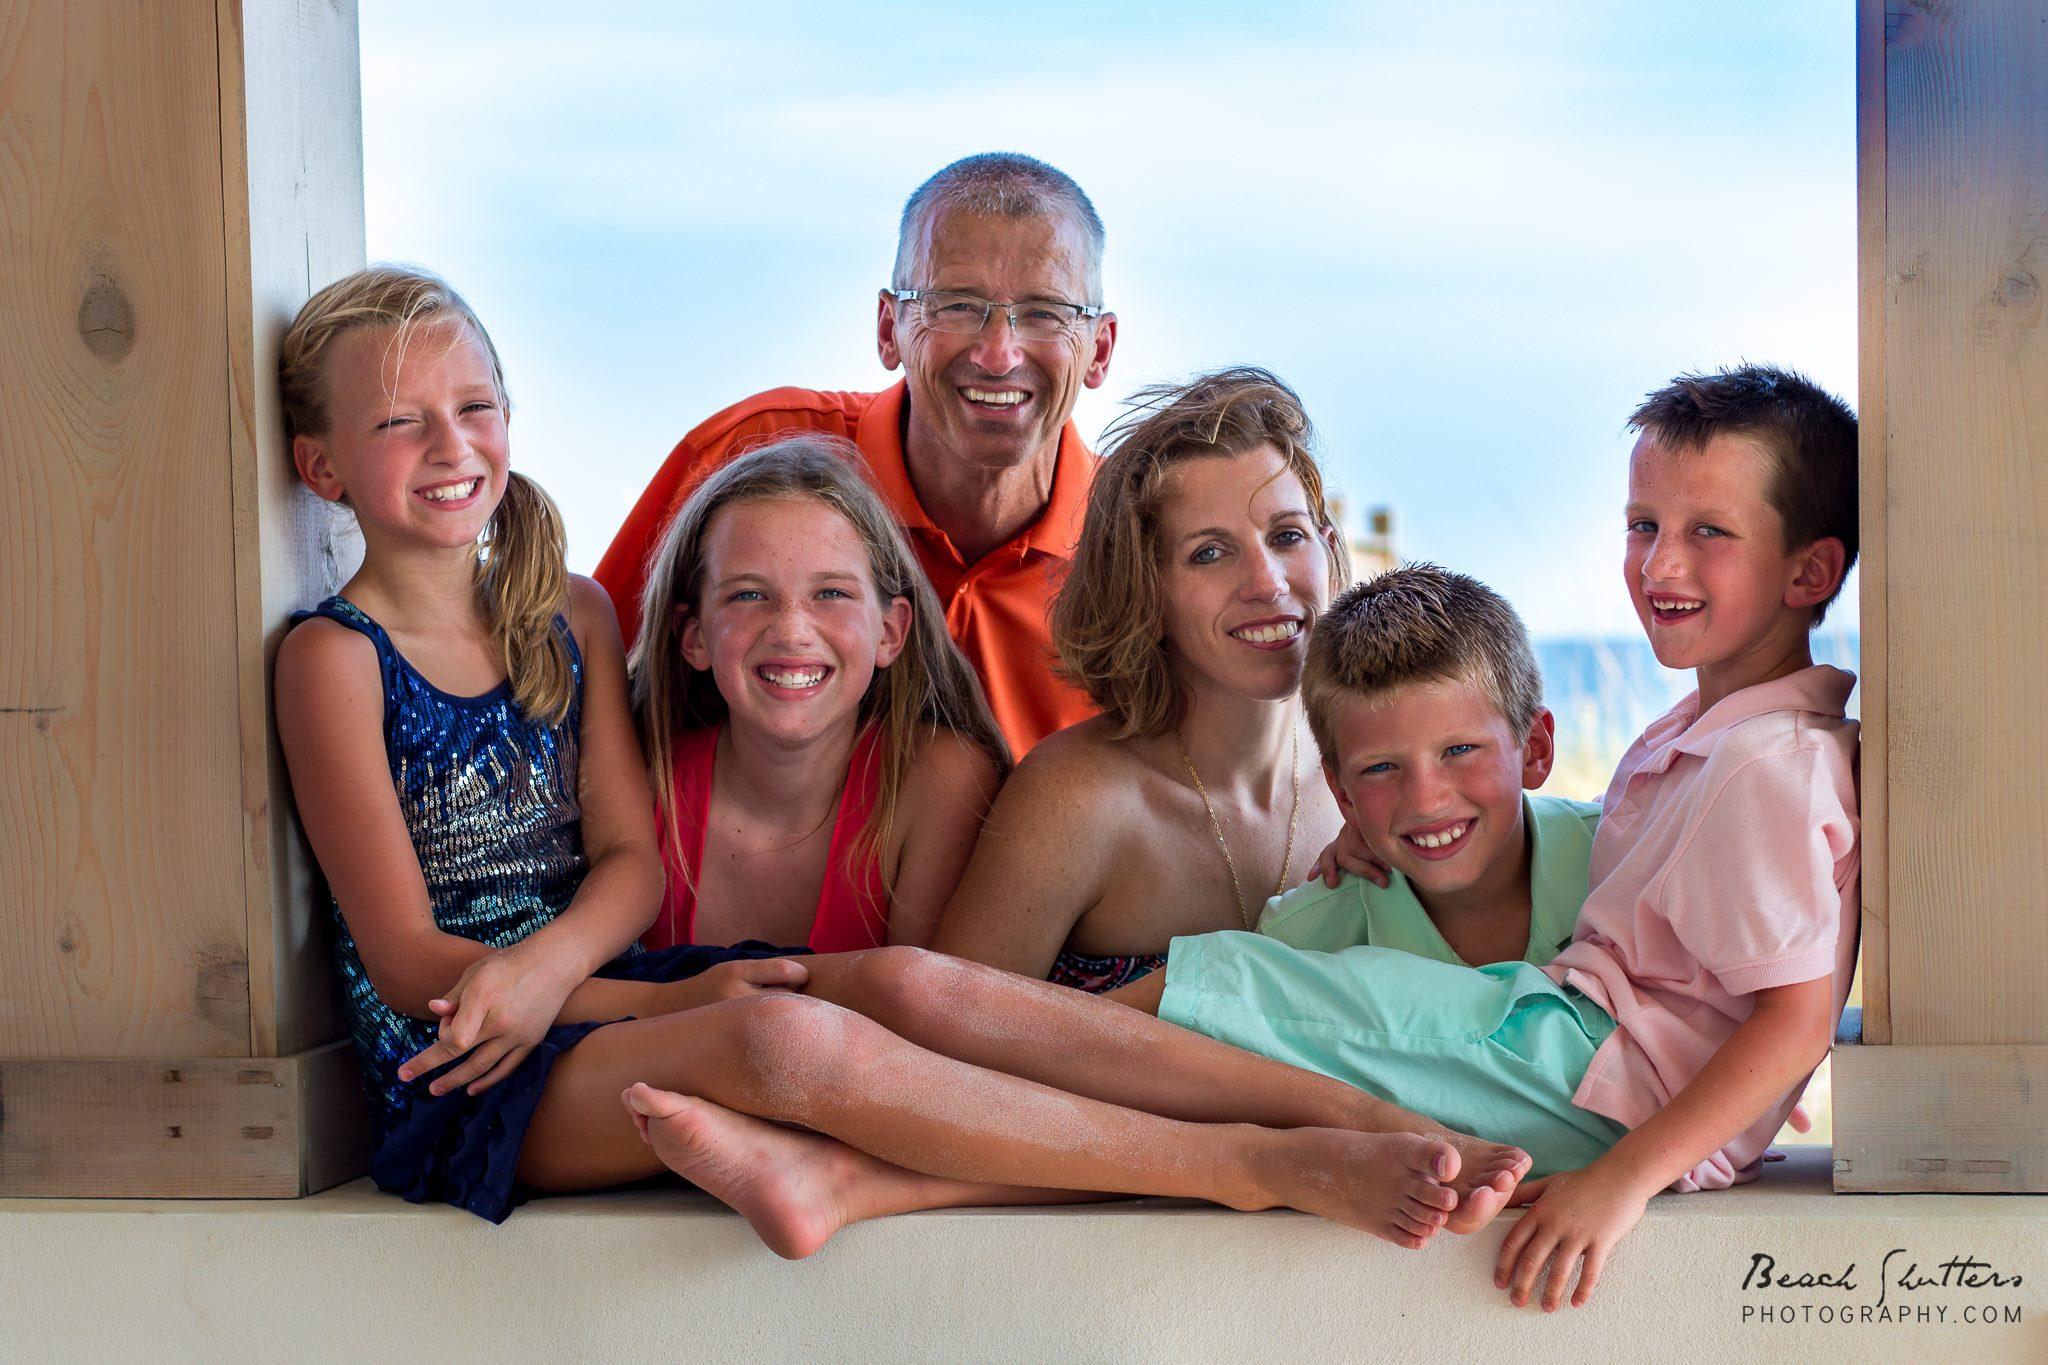 Family Beach Portraits - Beach Shutters Photography